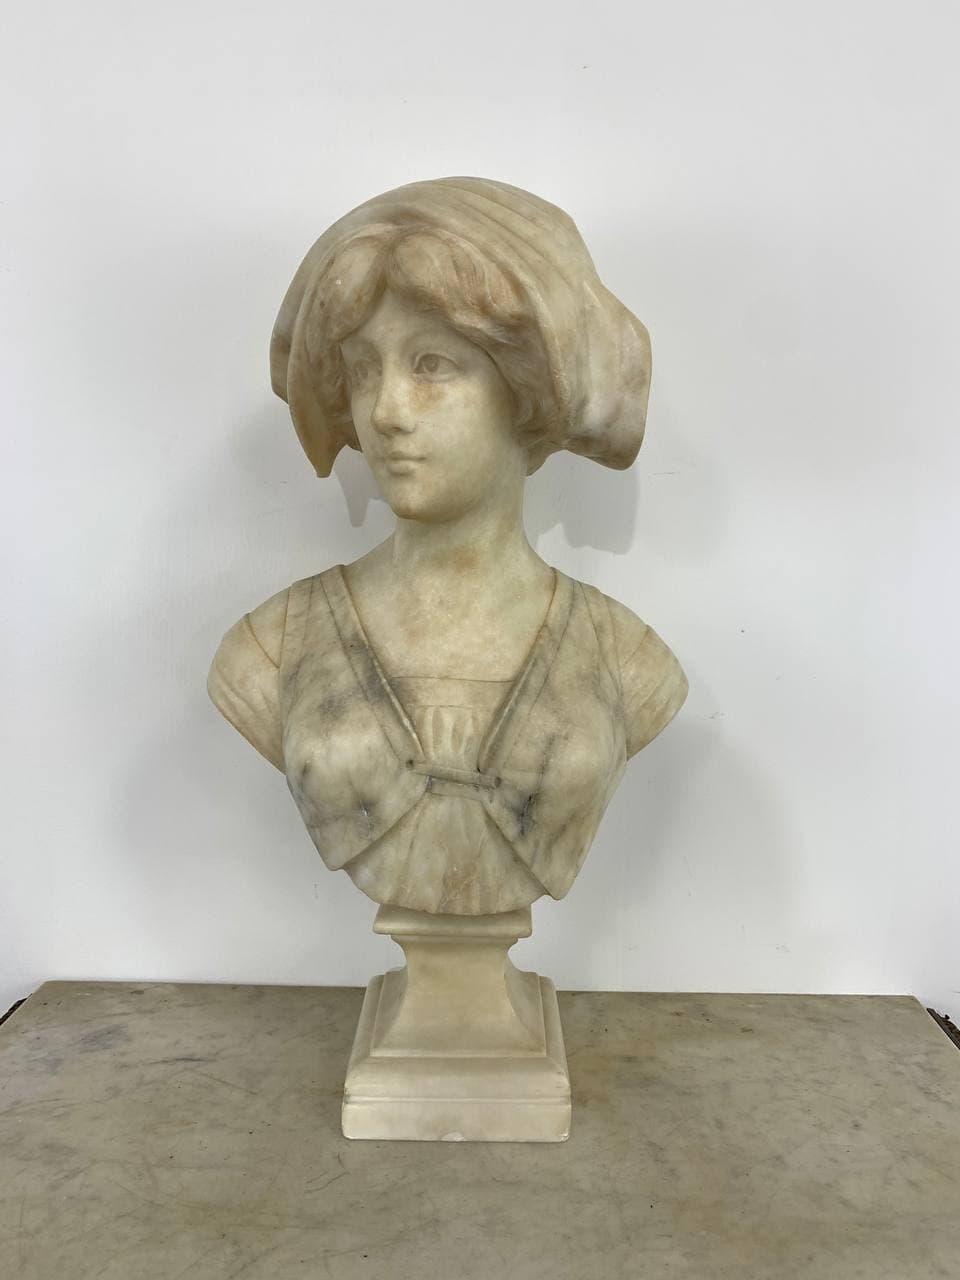 Антикварный бюст молодой девушки из мрамора